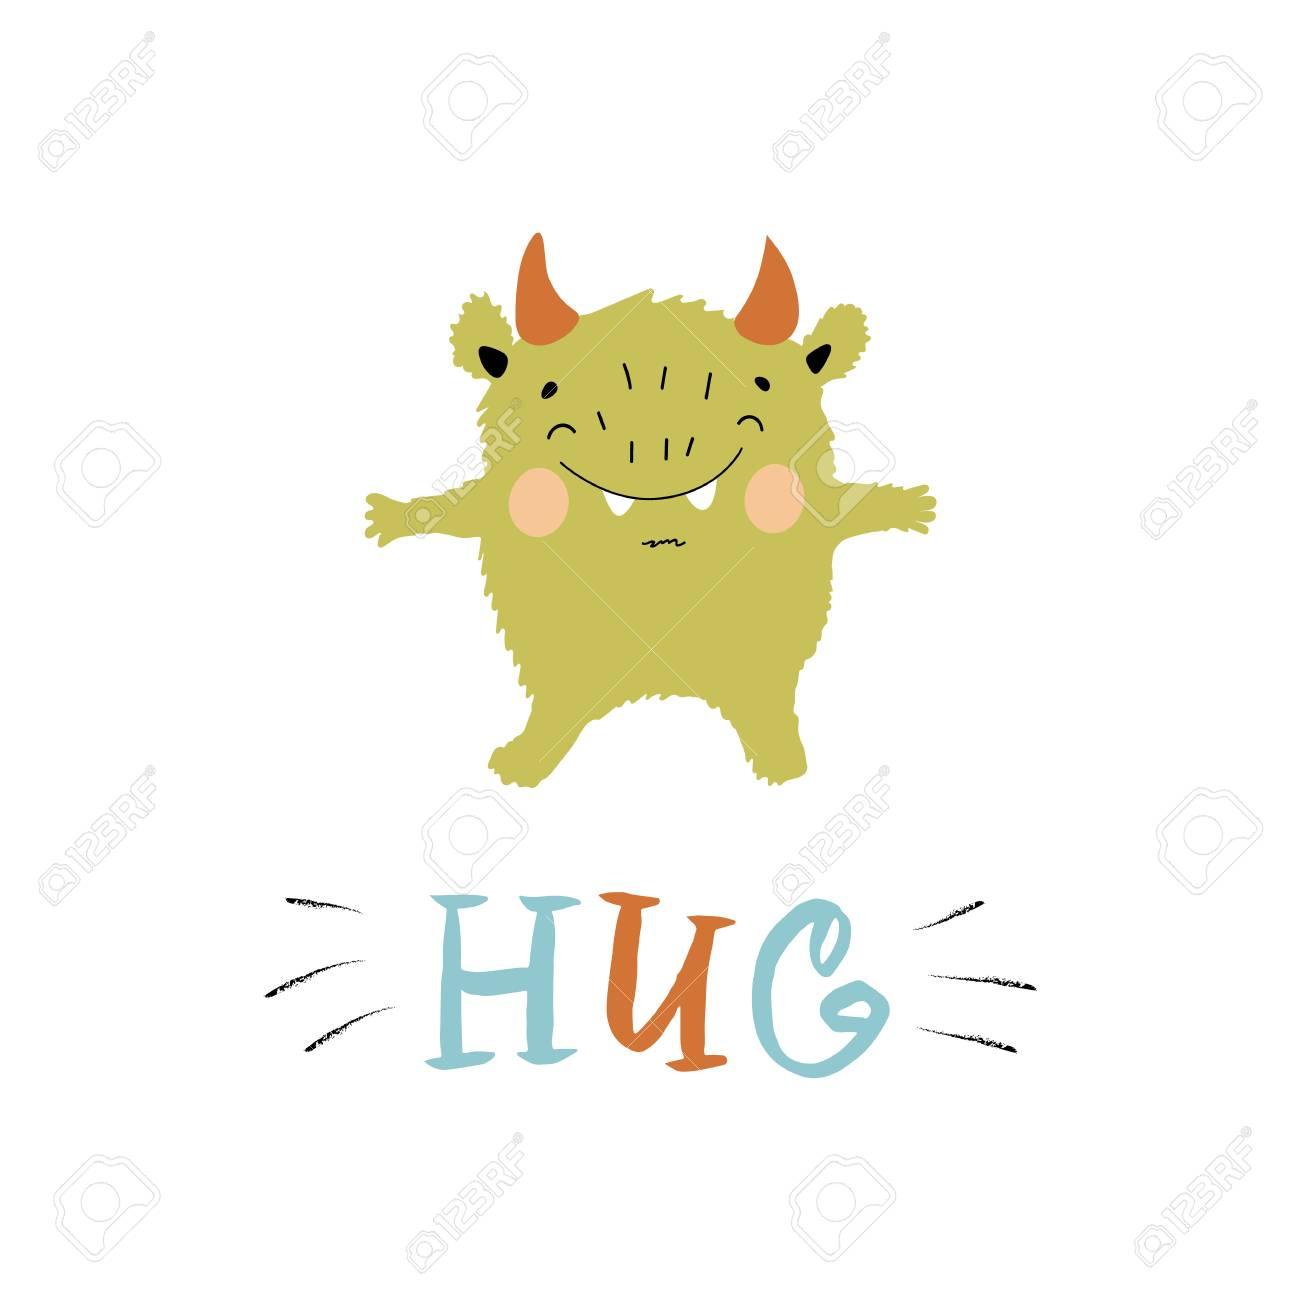 Hug Nursery Color Poster For Kids With Doodle In Scandinavian ...